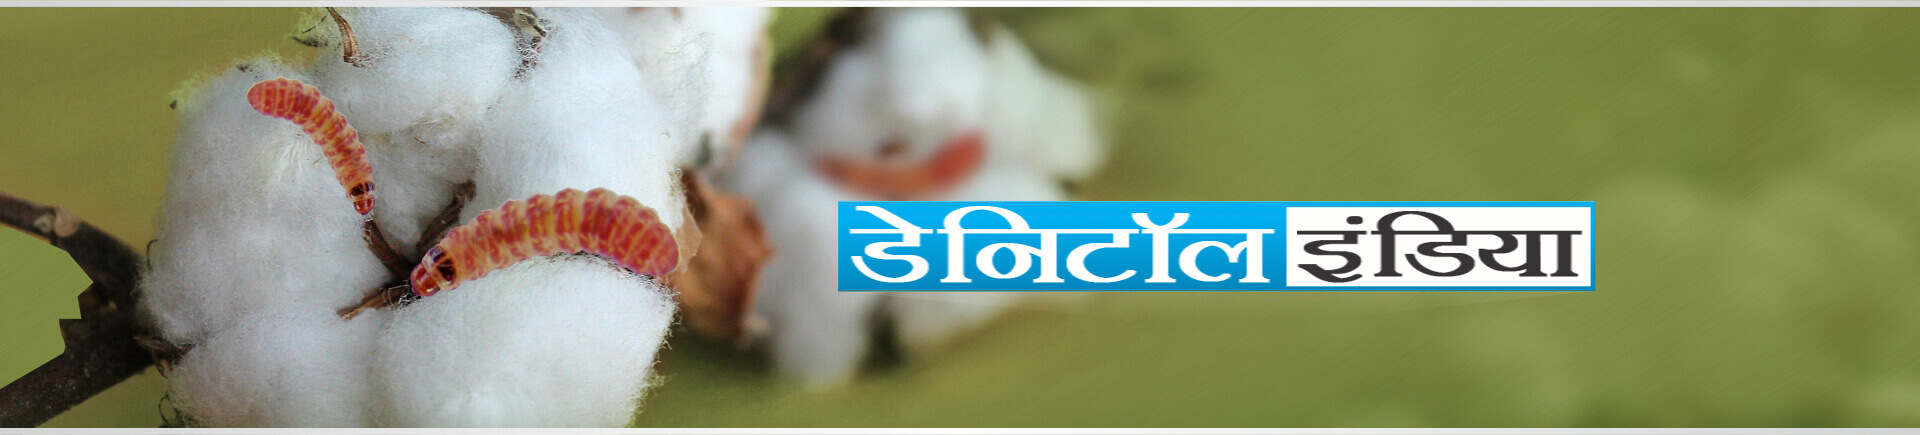 Sumitomo Danitol Website banner marathi